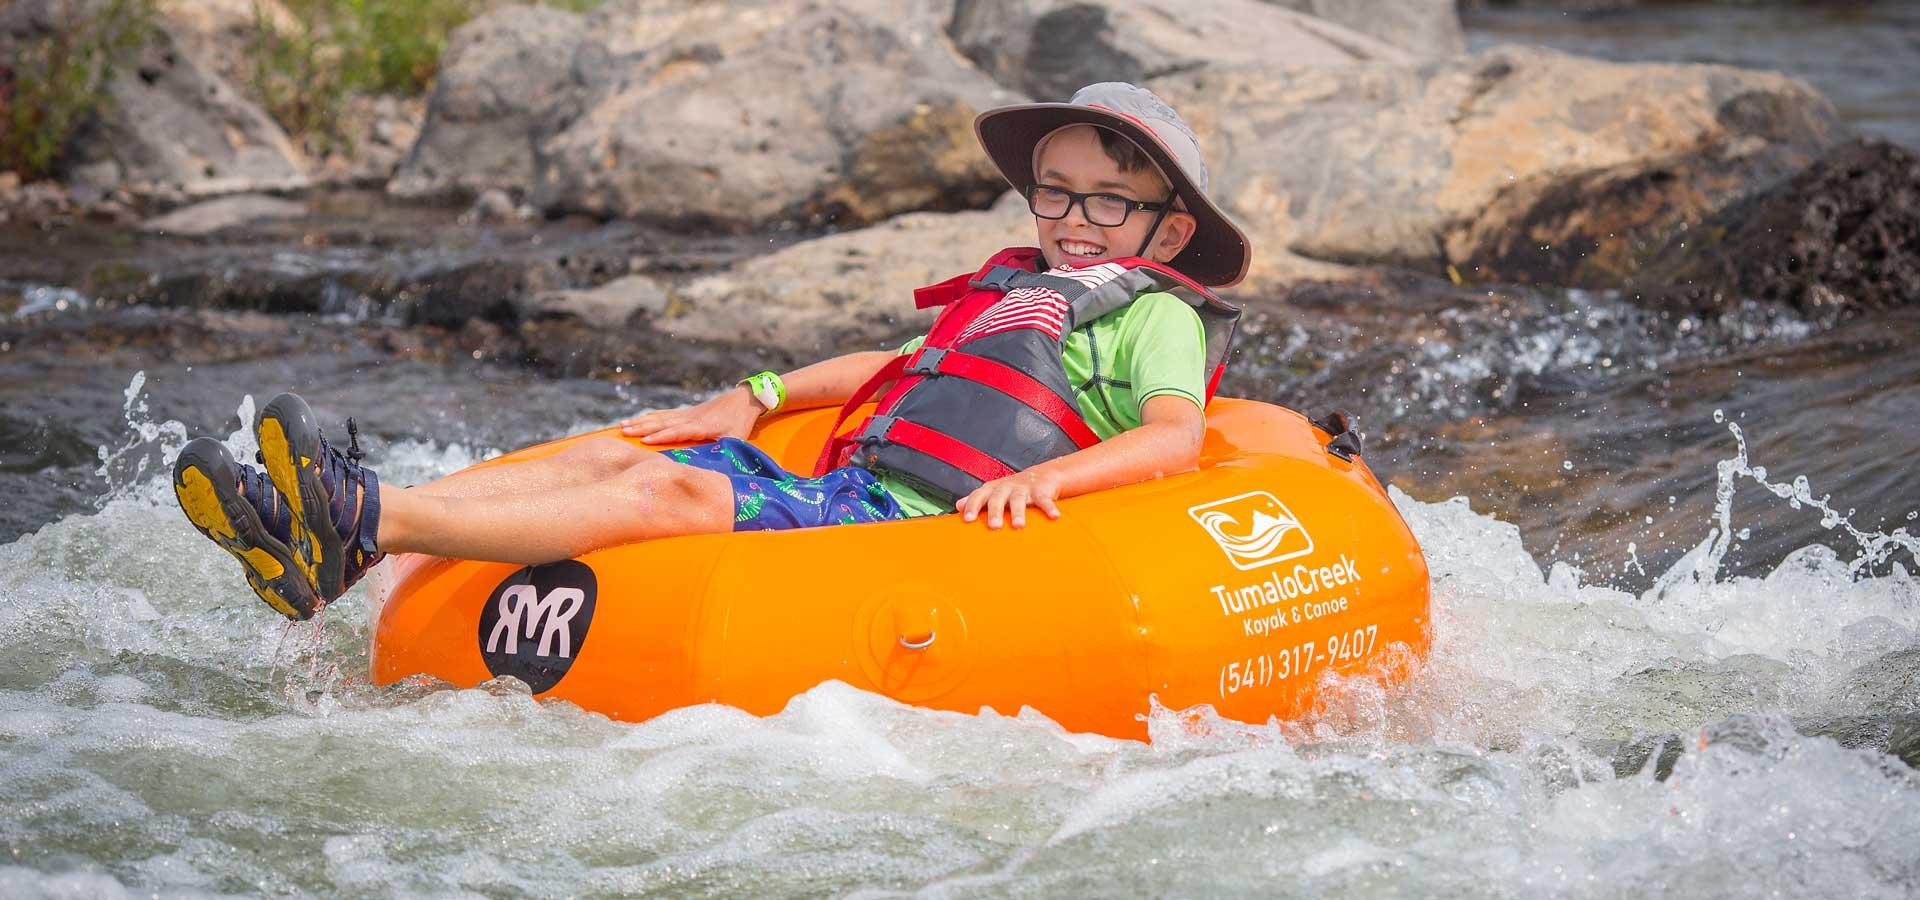 Boy on tube floating through rapids